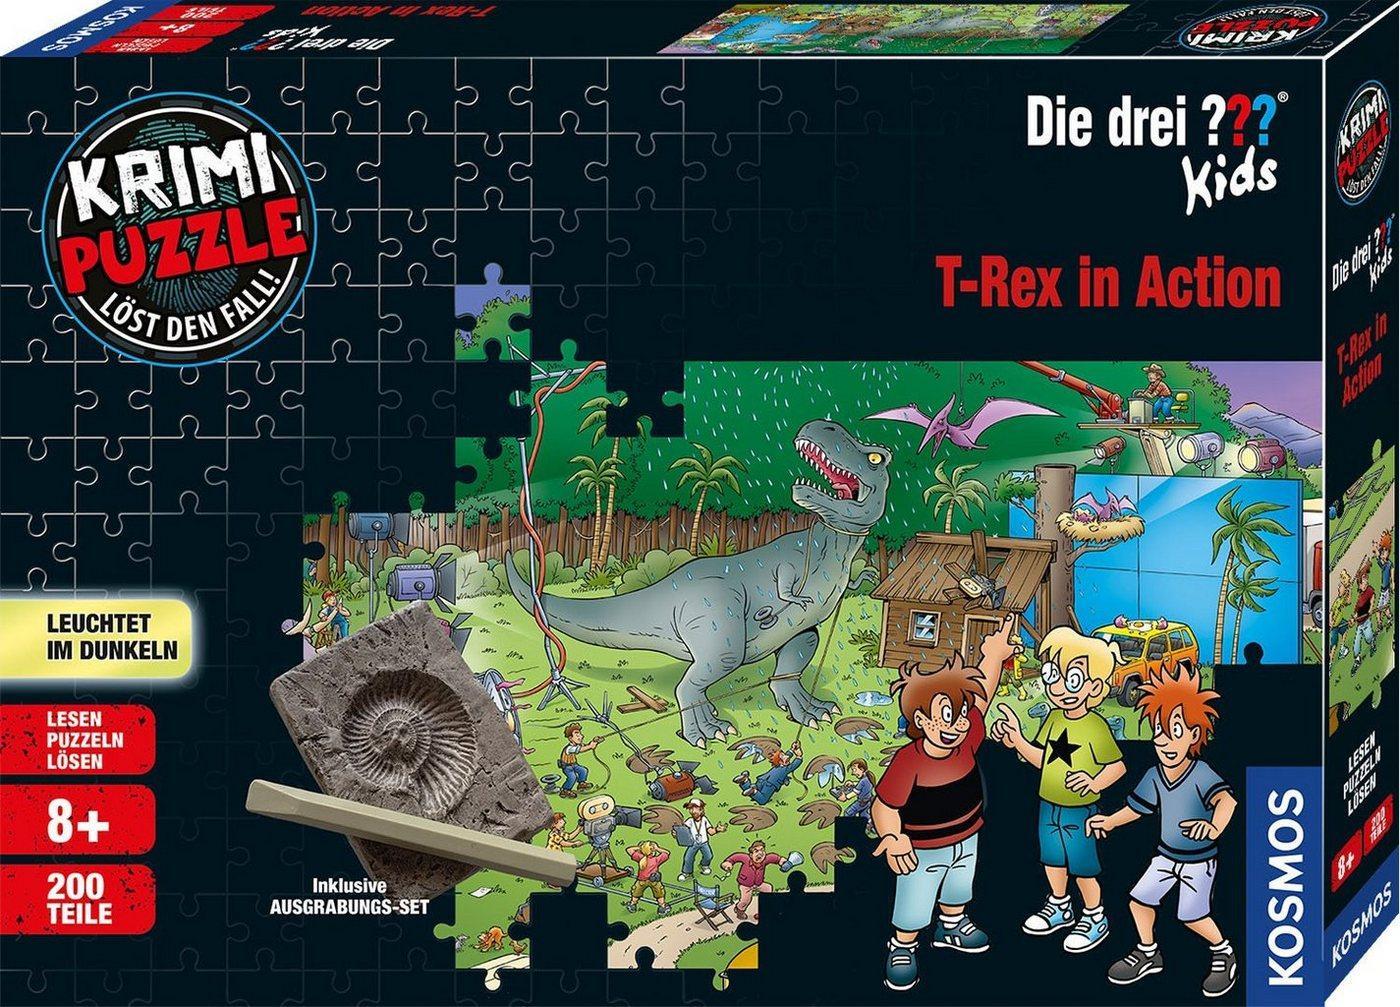 Kosmos Puzzle »Krimipuzzle Die drei ??? Kids T-Rex in Action«, 200 Puzzleteile, Made in Germany